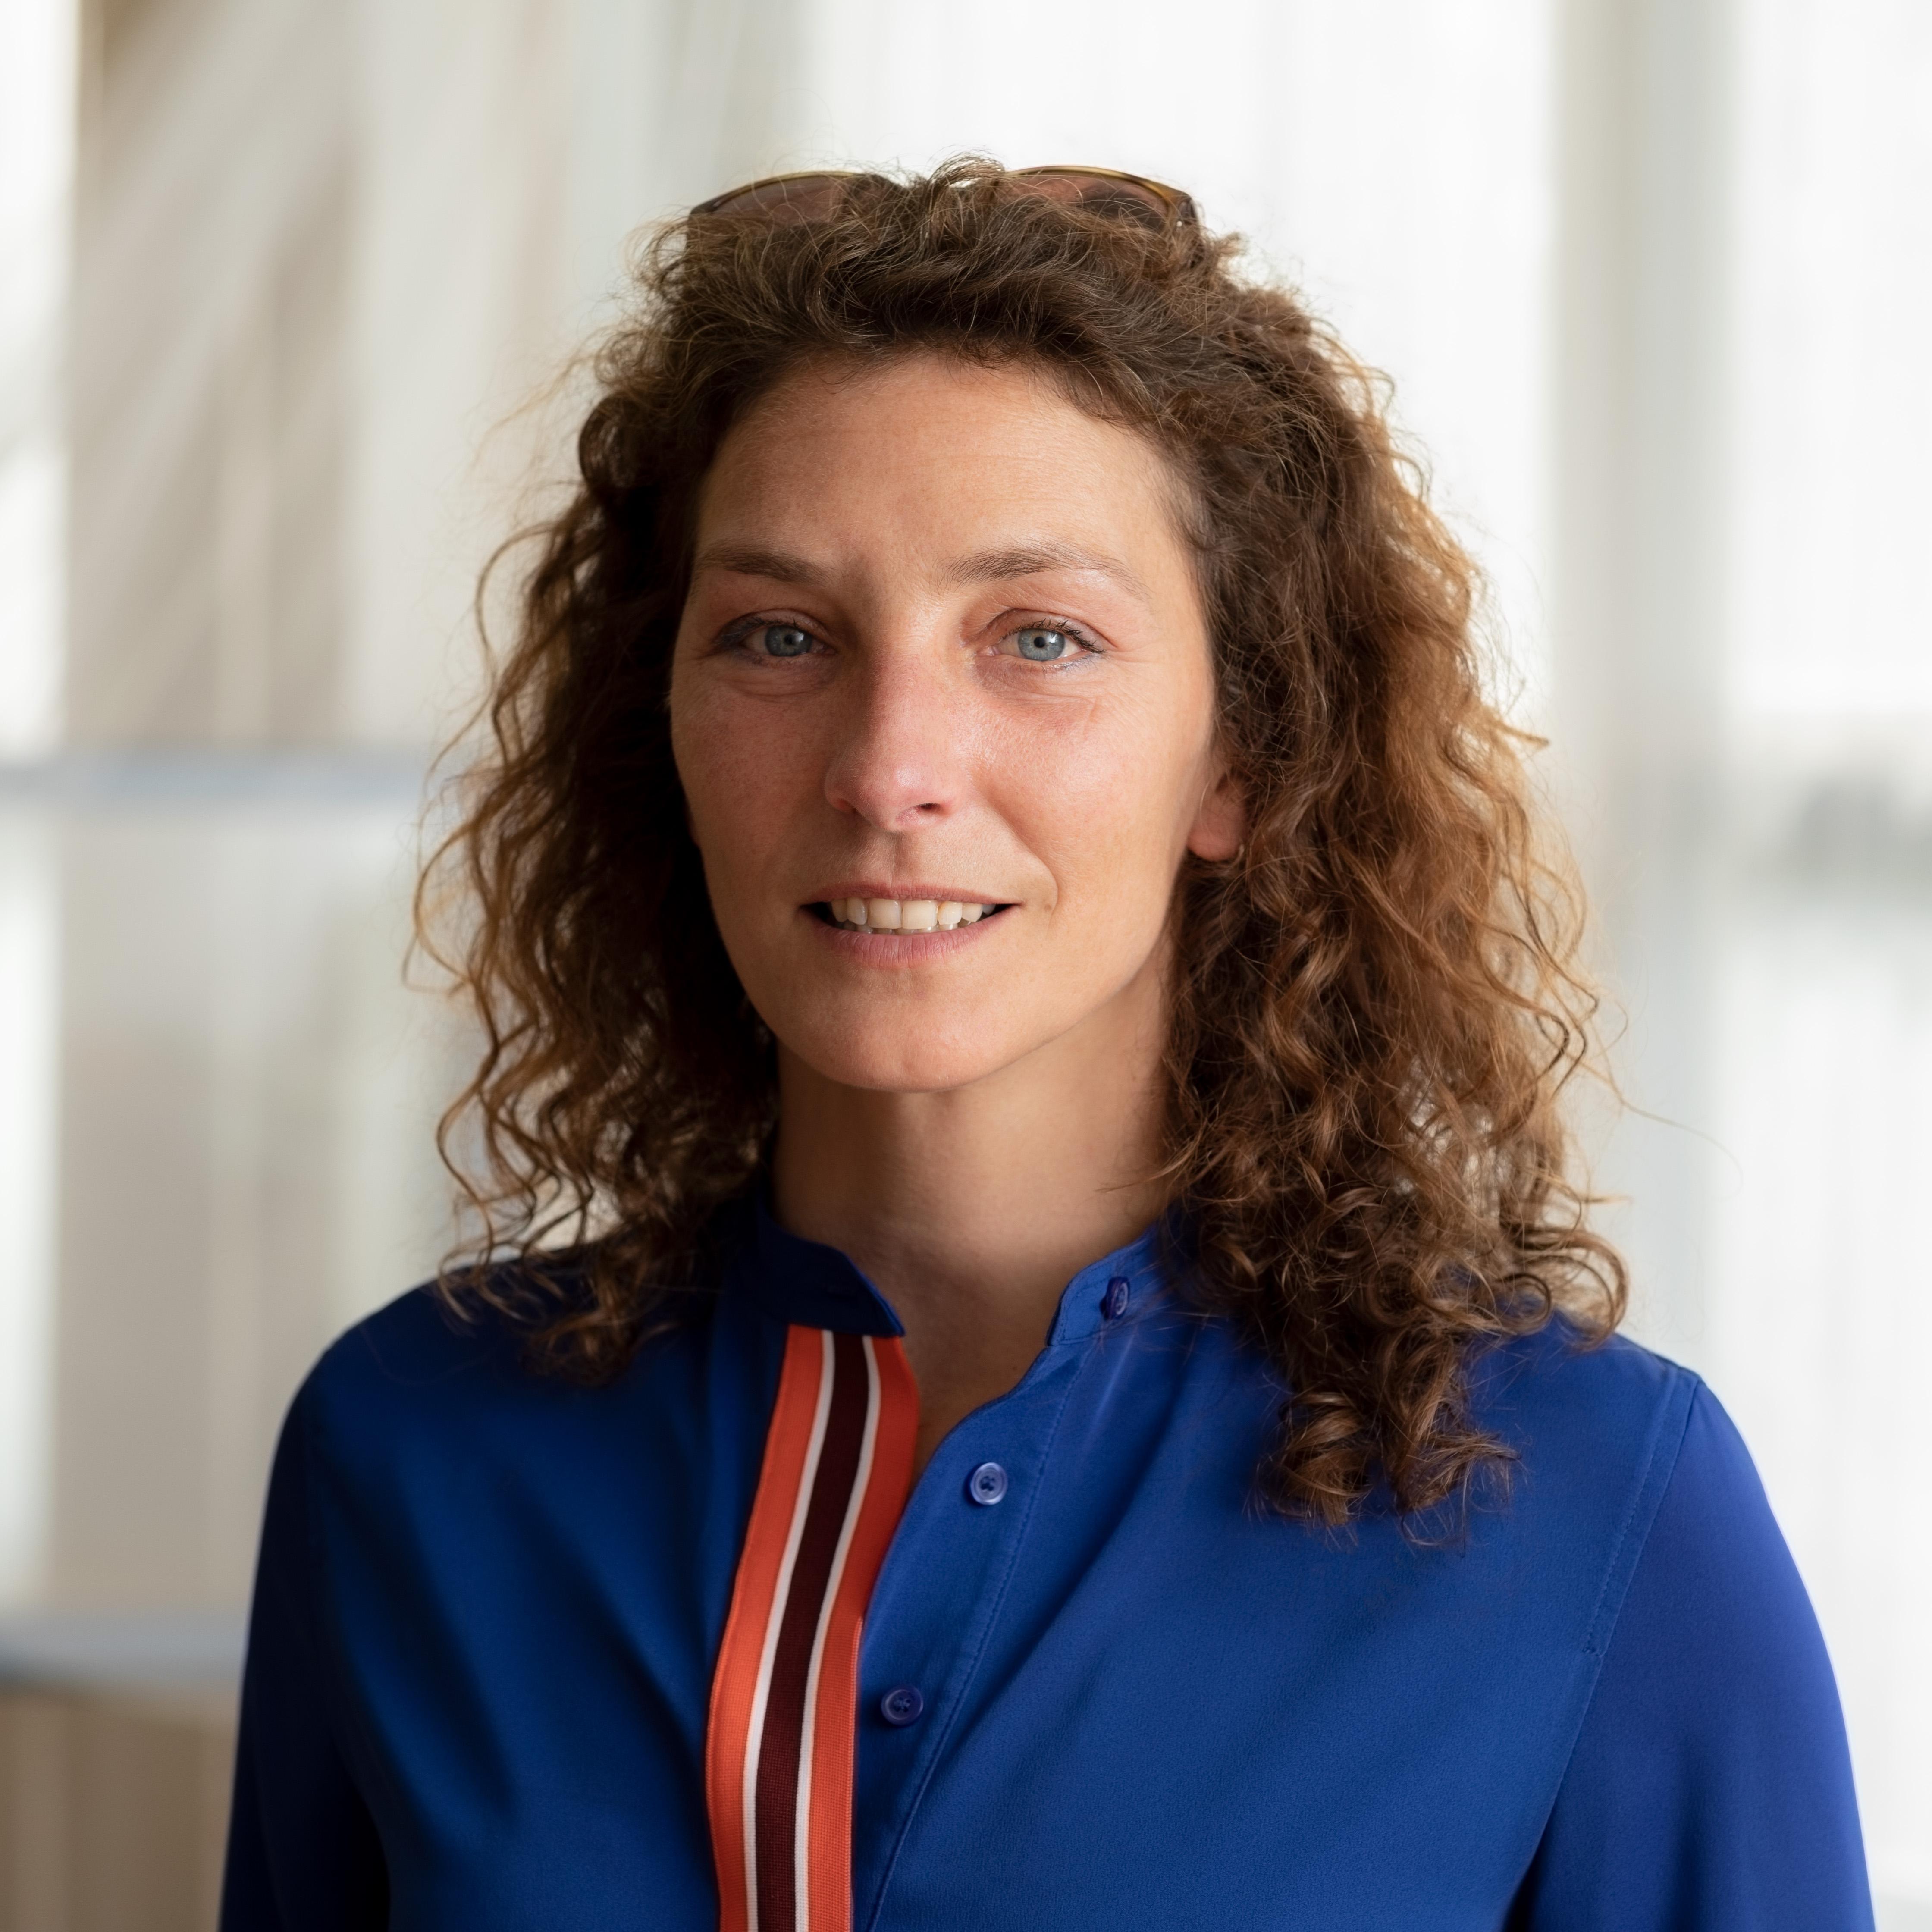 Isabelle-Chaffaud-Hessel-Waalewijn